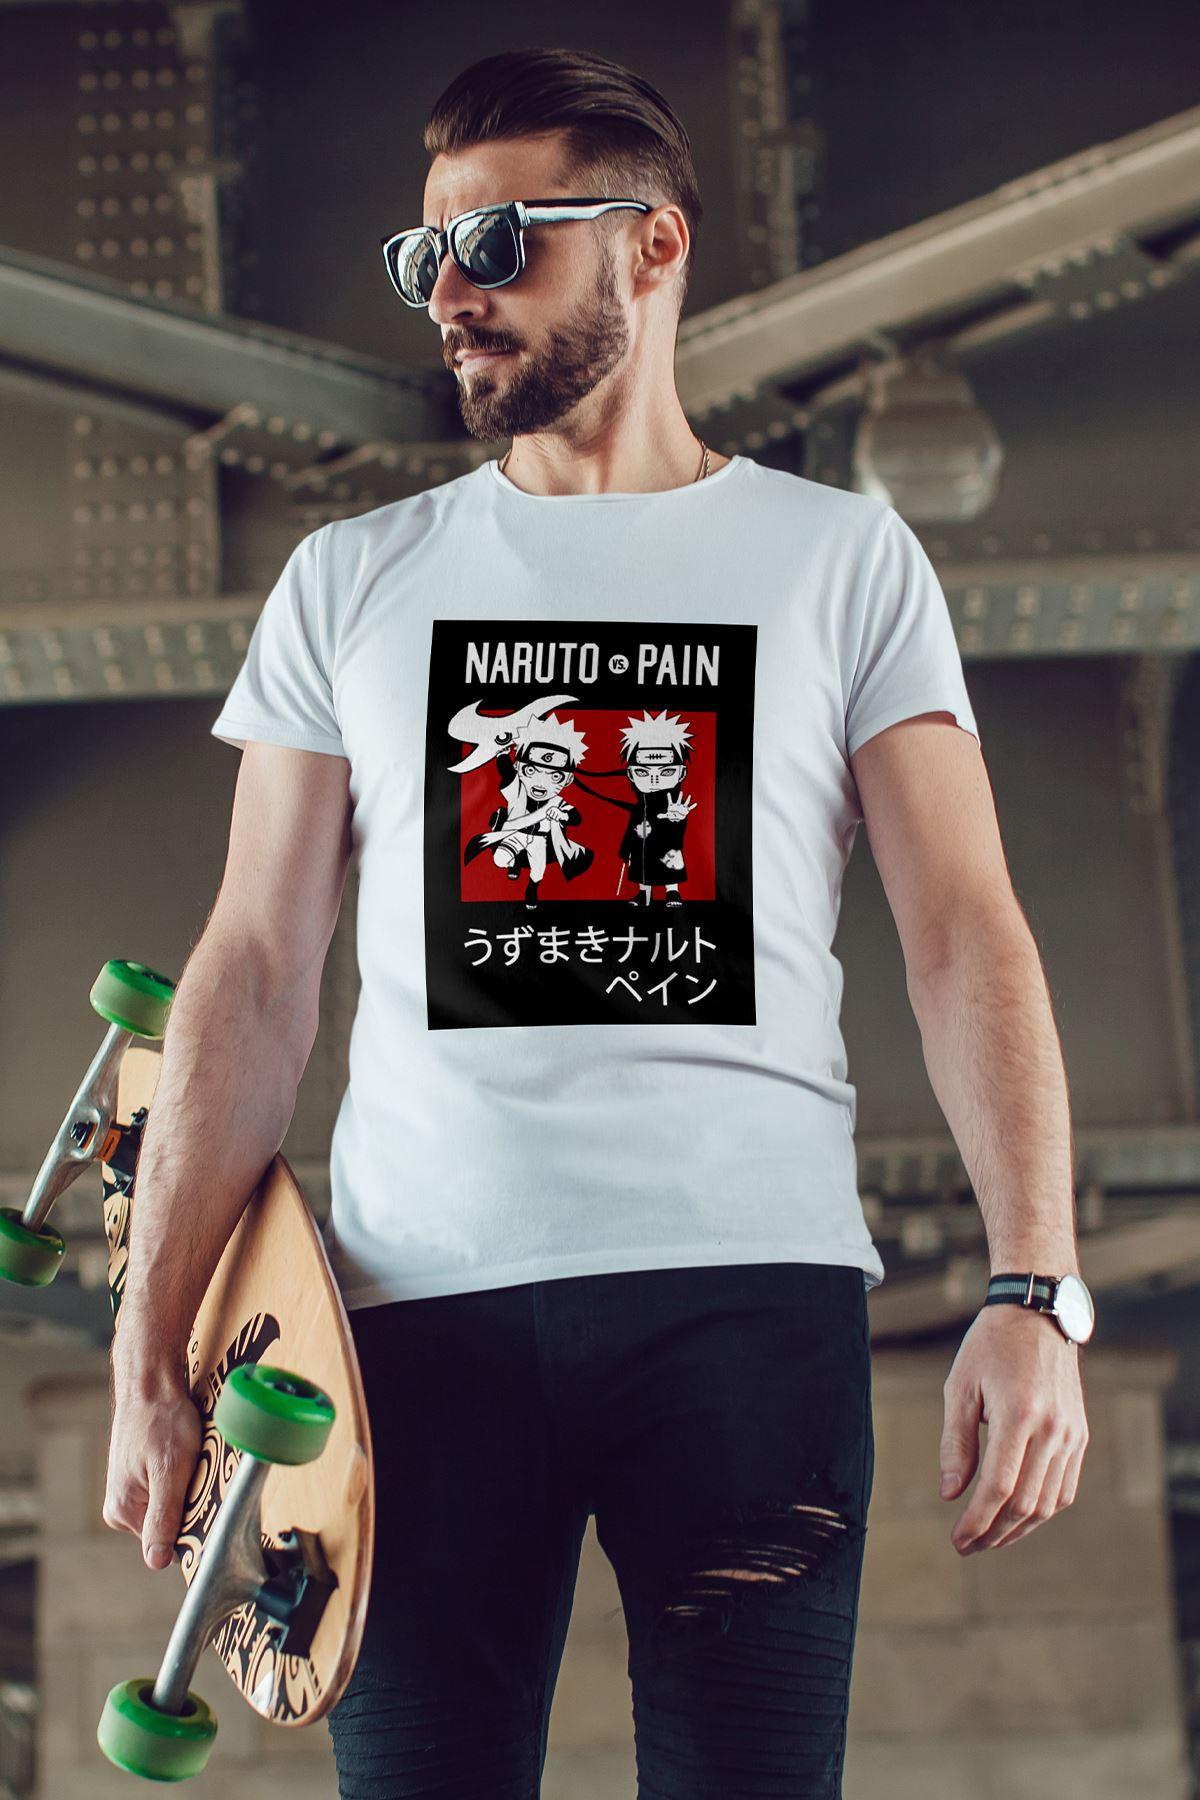 Naruto Anime 04 Beyaz Erkek Tshirt - Tişört